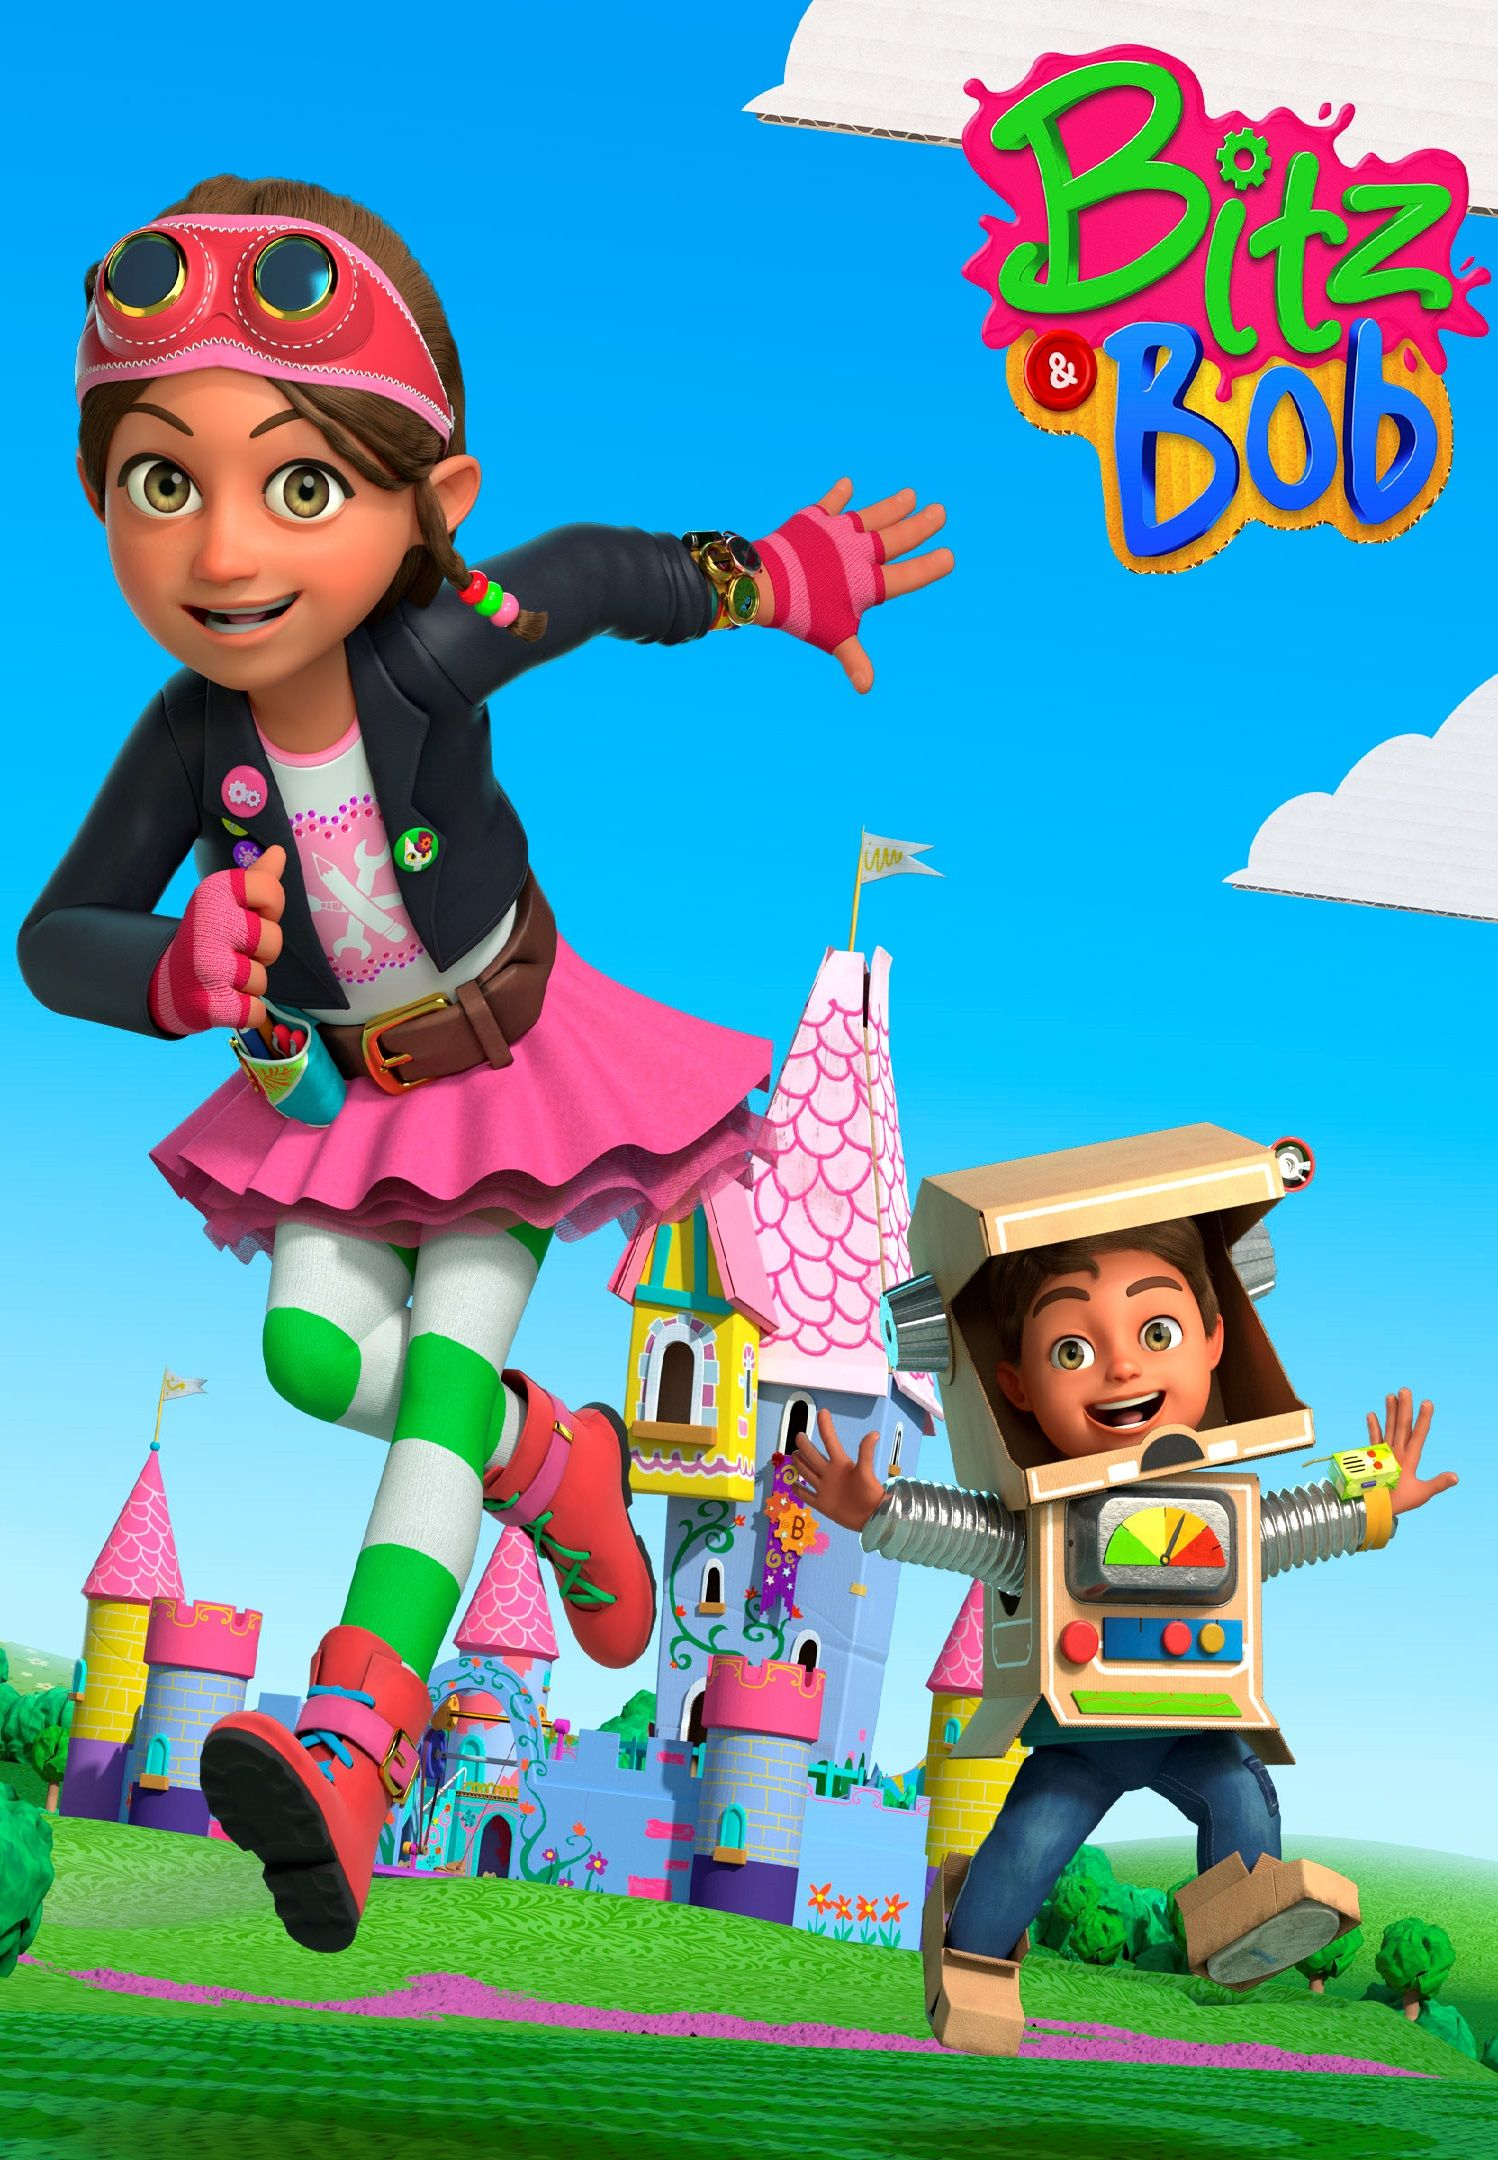 Bitz and Bob ne zaman